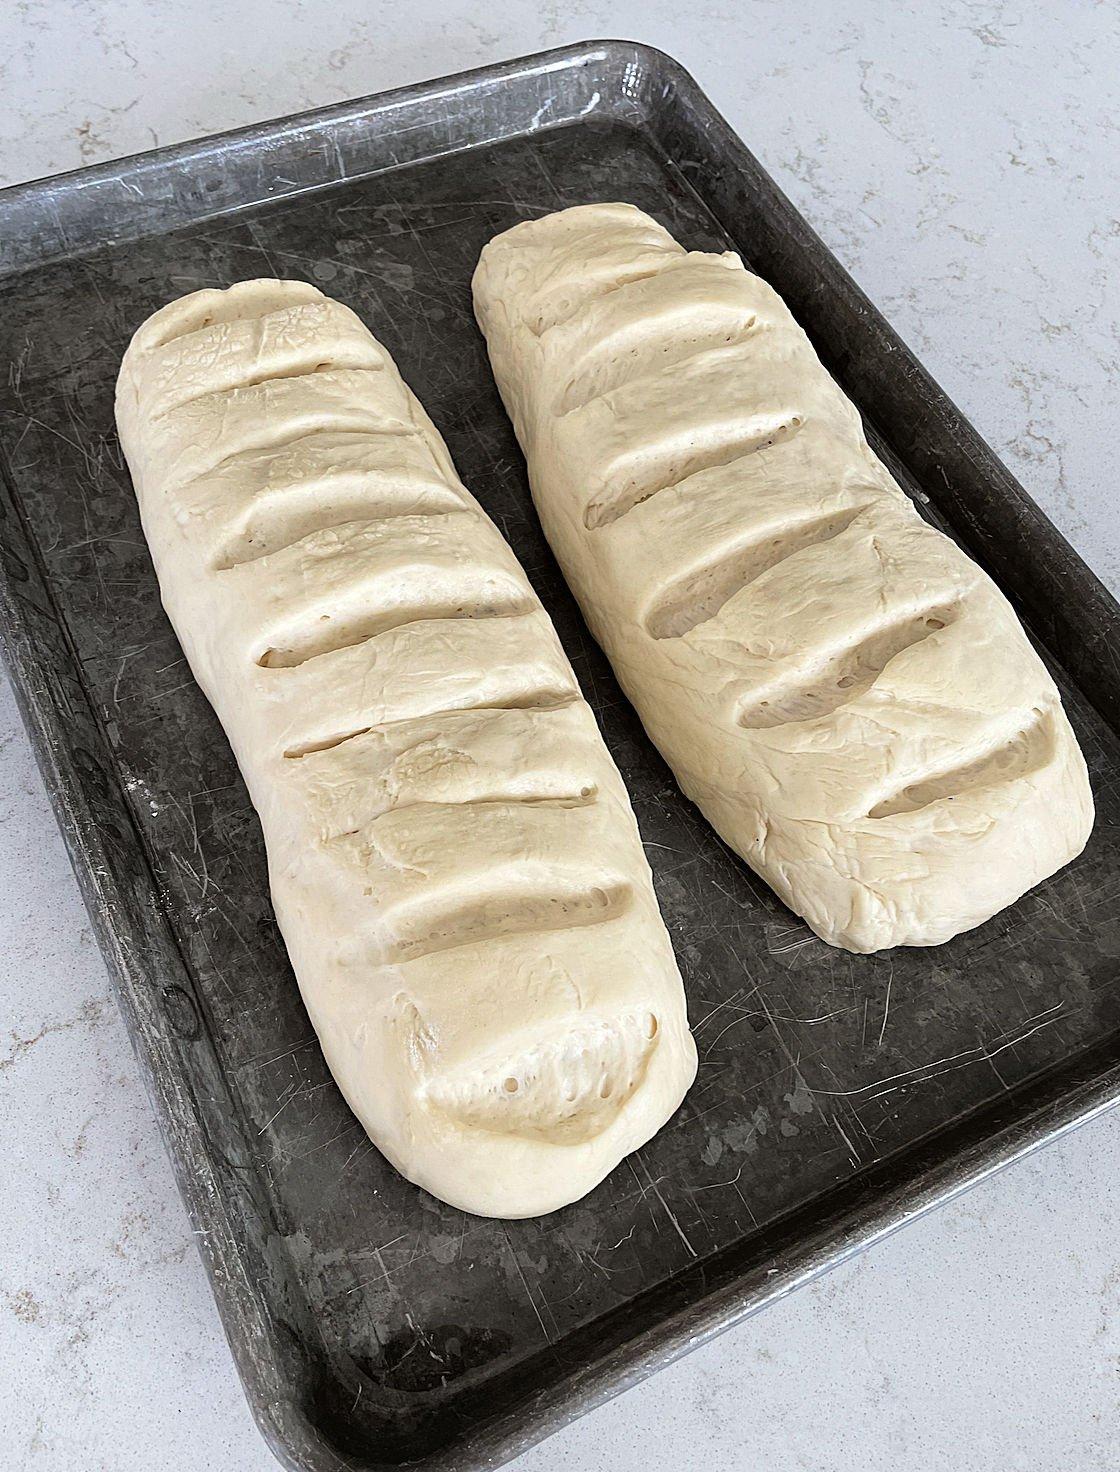 dough risen until it's doubled in size